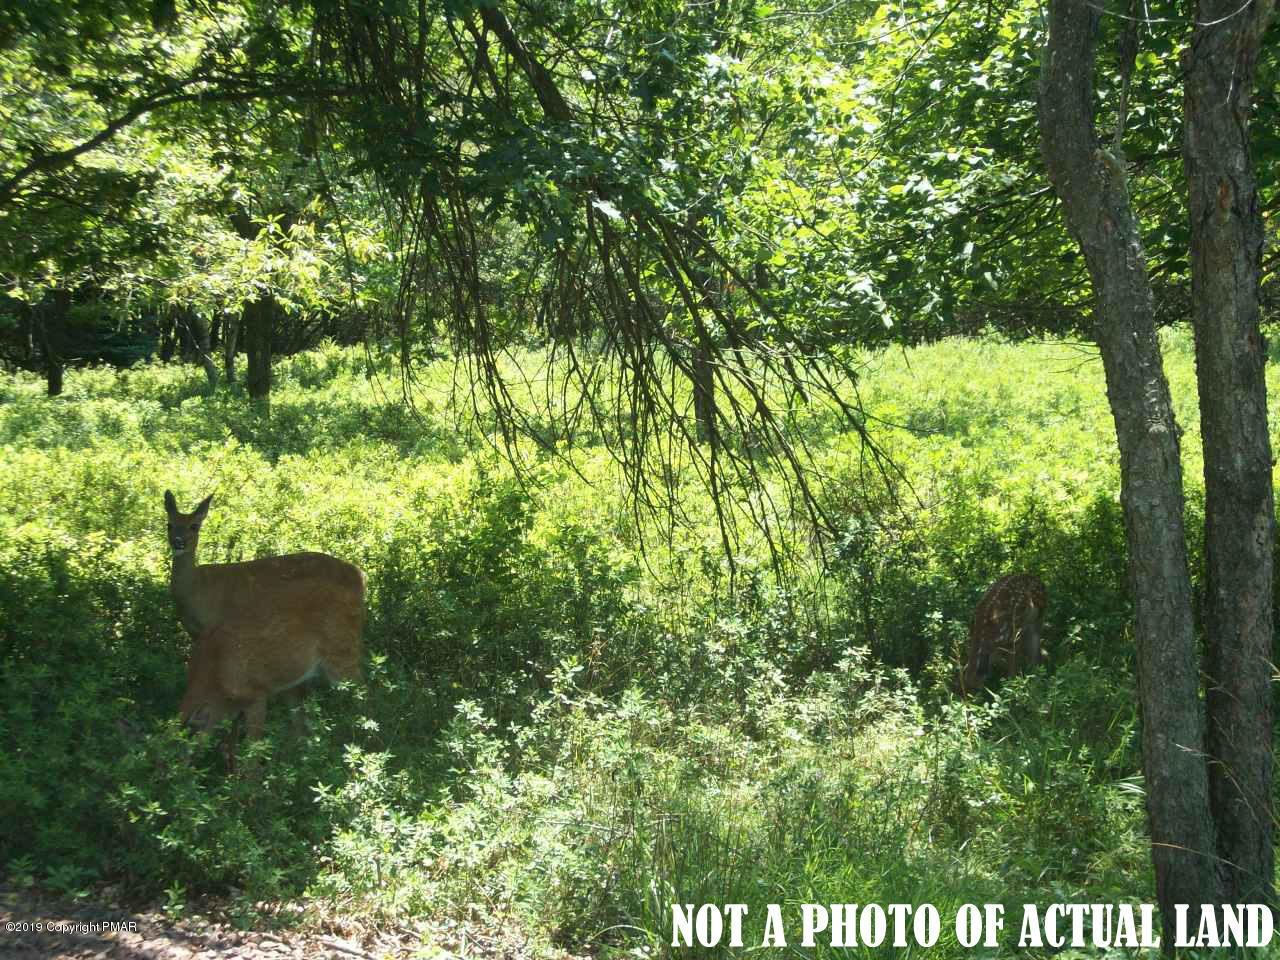 EV1690 Lucretius Trail, Albrightsville, PA, 18210 United States